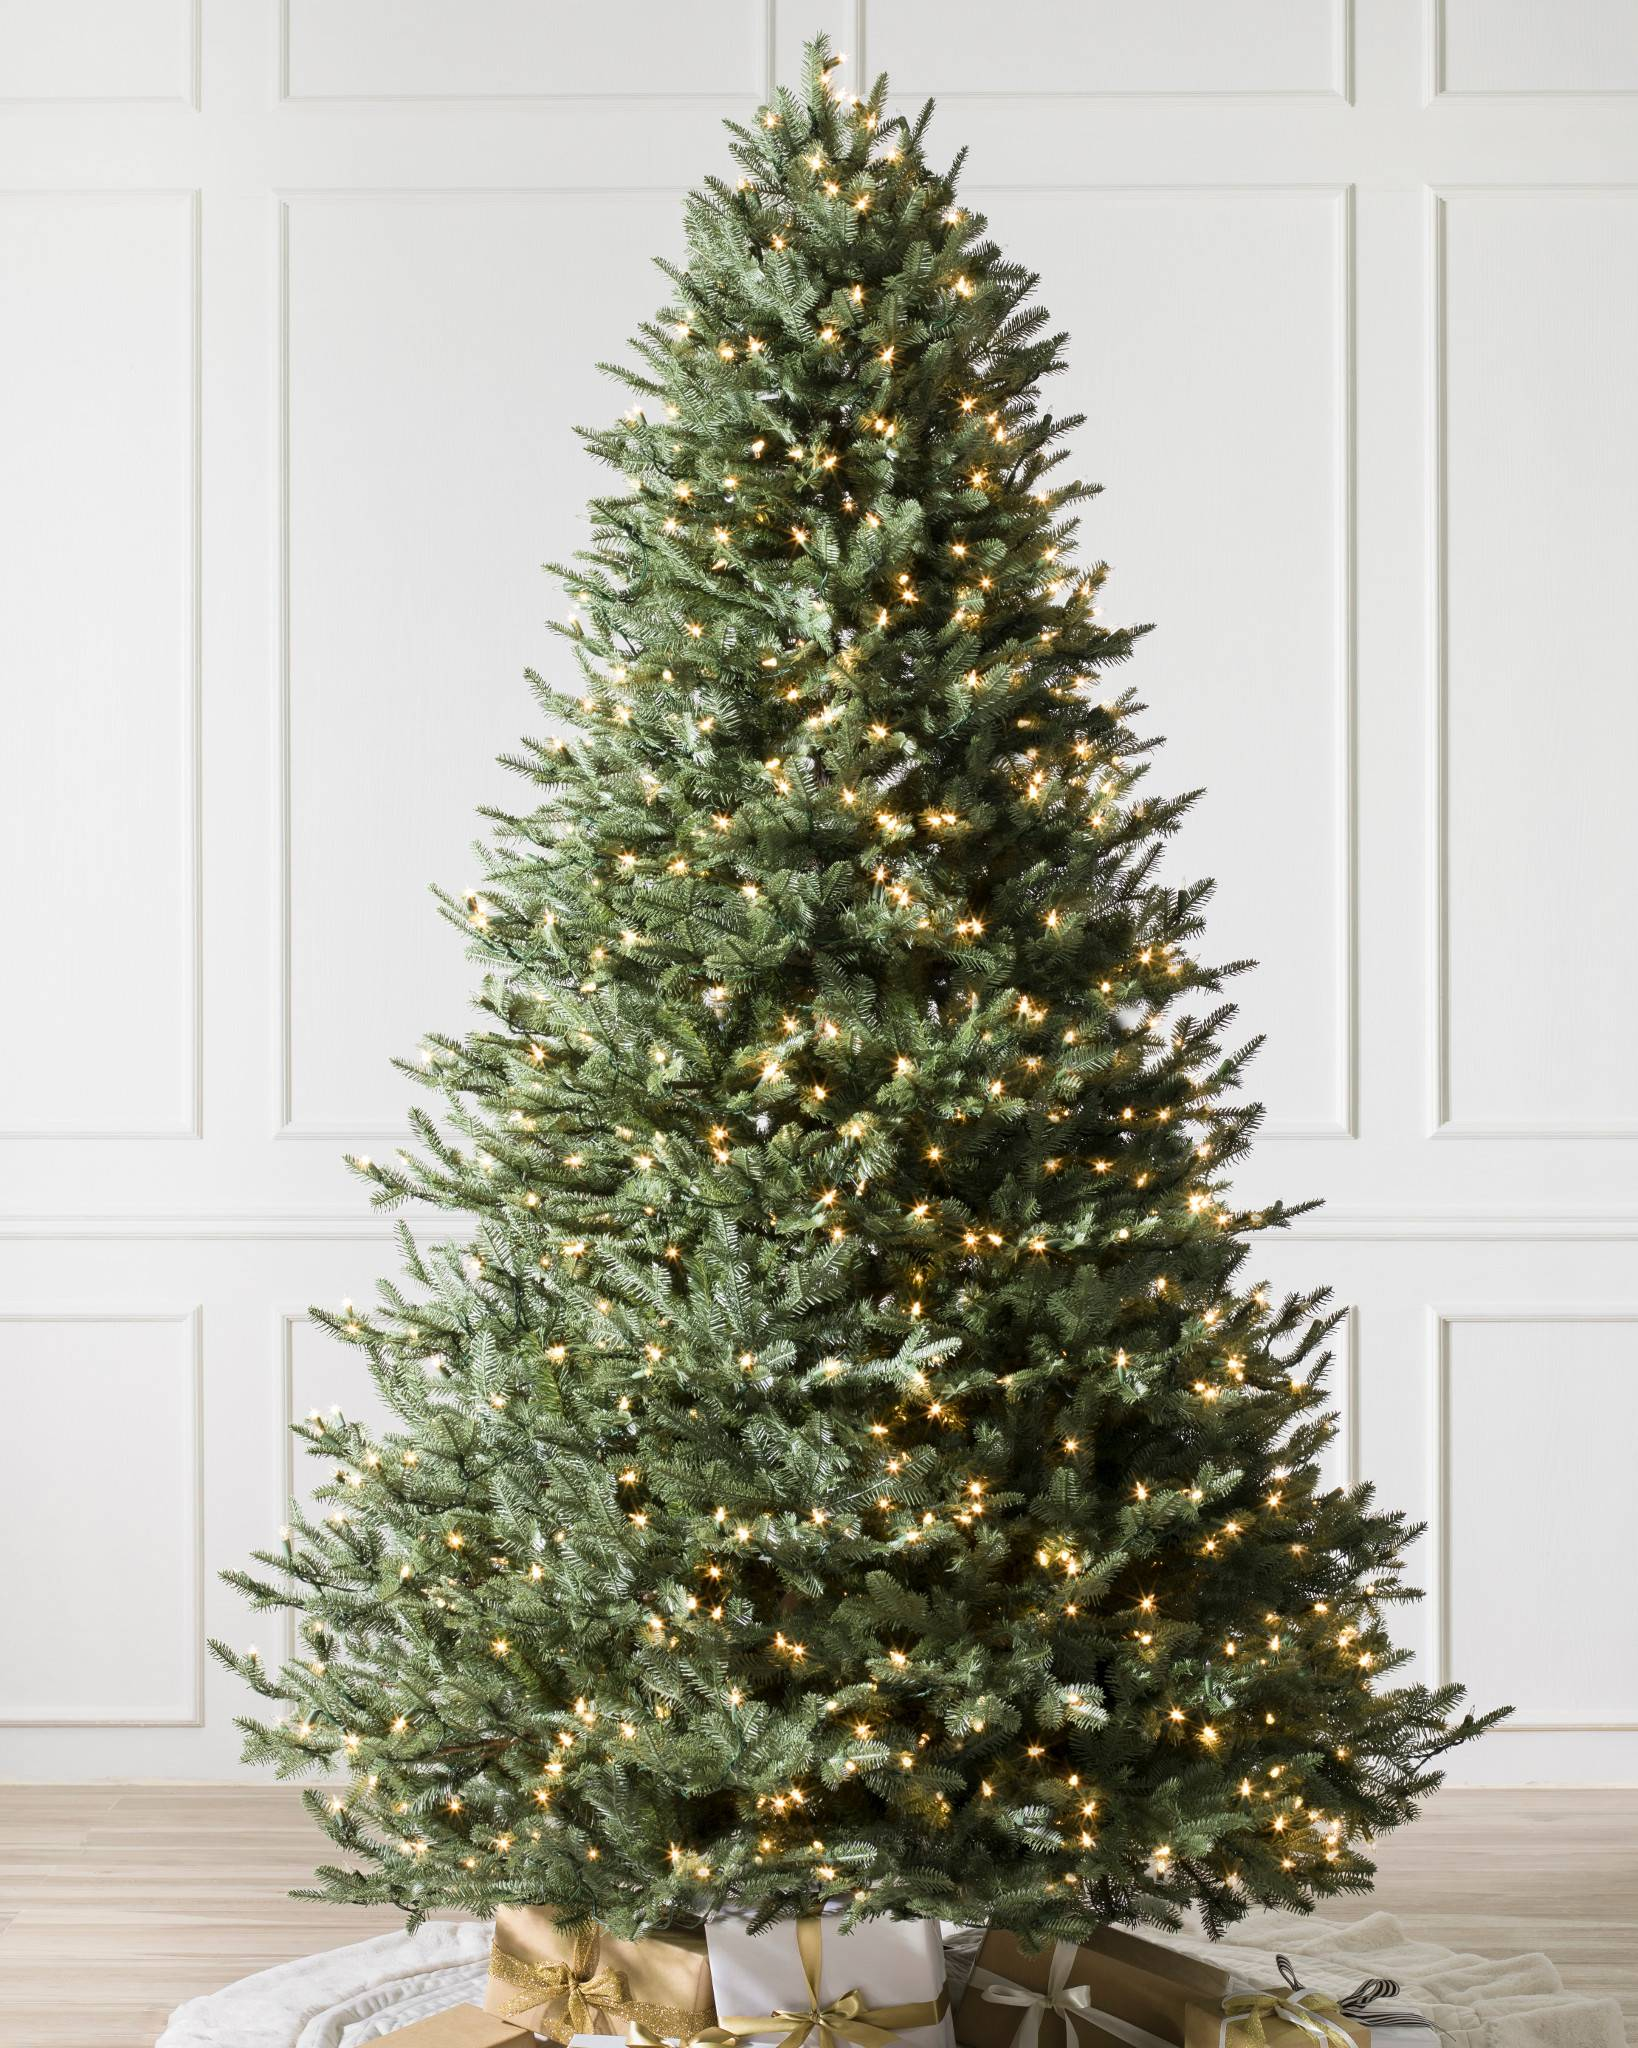 Balsam Christmas Trees.Bh Balsam Fir Christmas Tree Balsam Hill